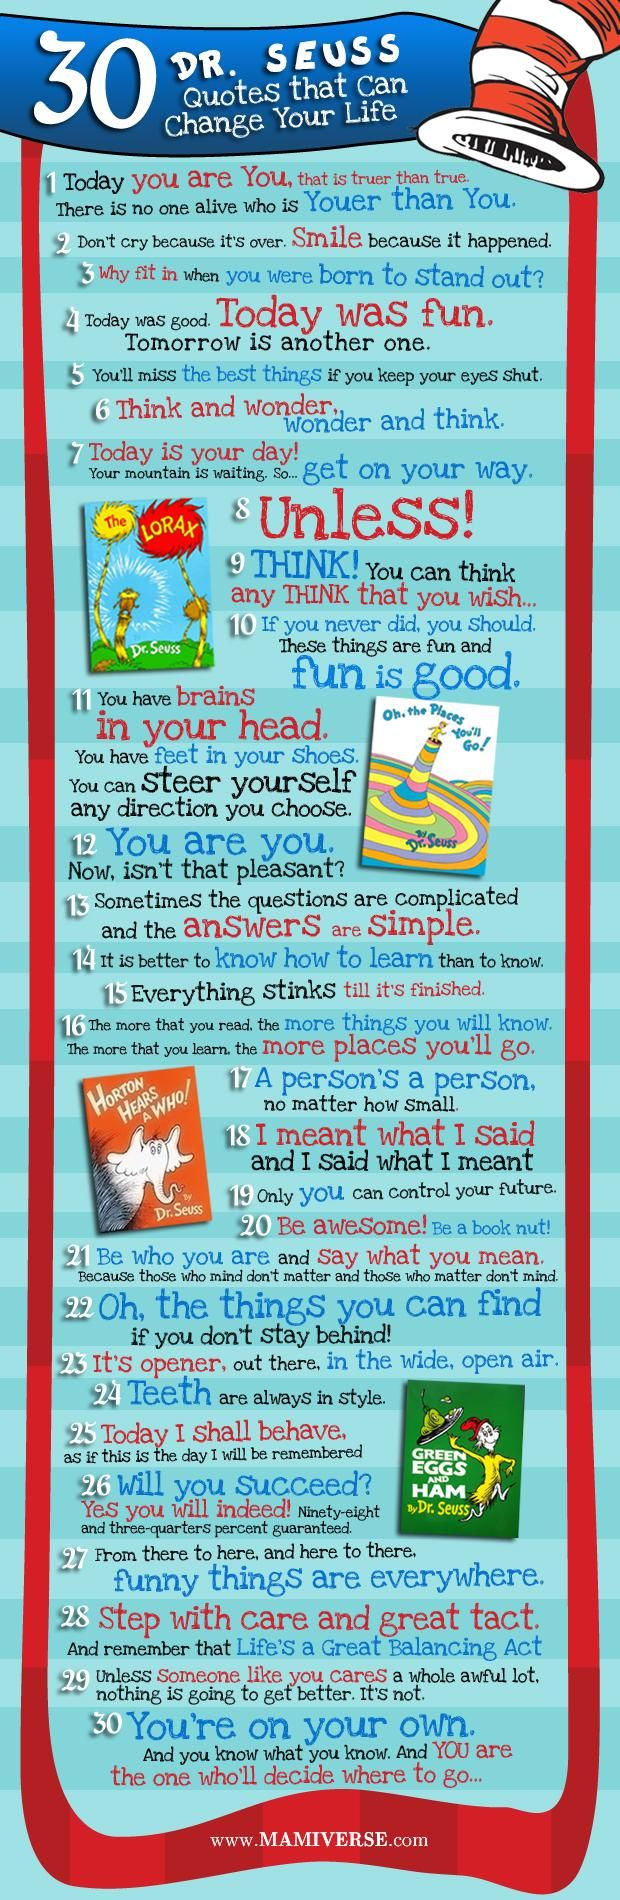 30 Dr. Seuss Quotes #infographic Do you have a favorite?: Ideas, Inspiration, Drseus, Life Lessons, Kids, Dr Suess, Seuss Quotes, Dr. Seuss, Dr. Suess